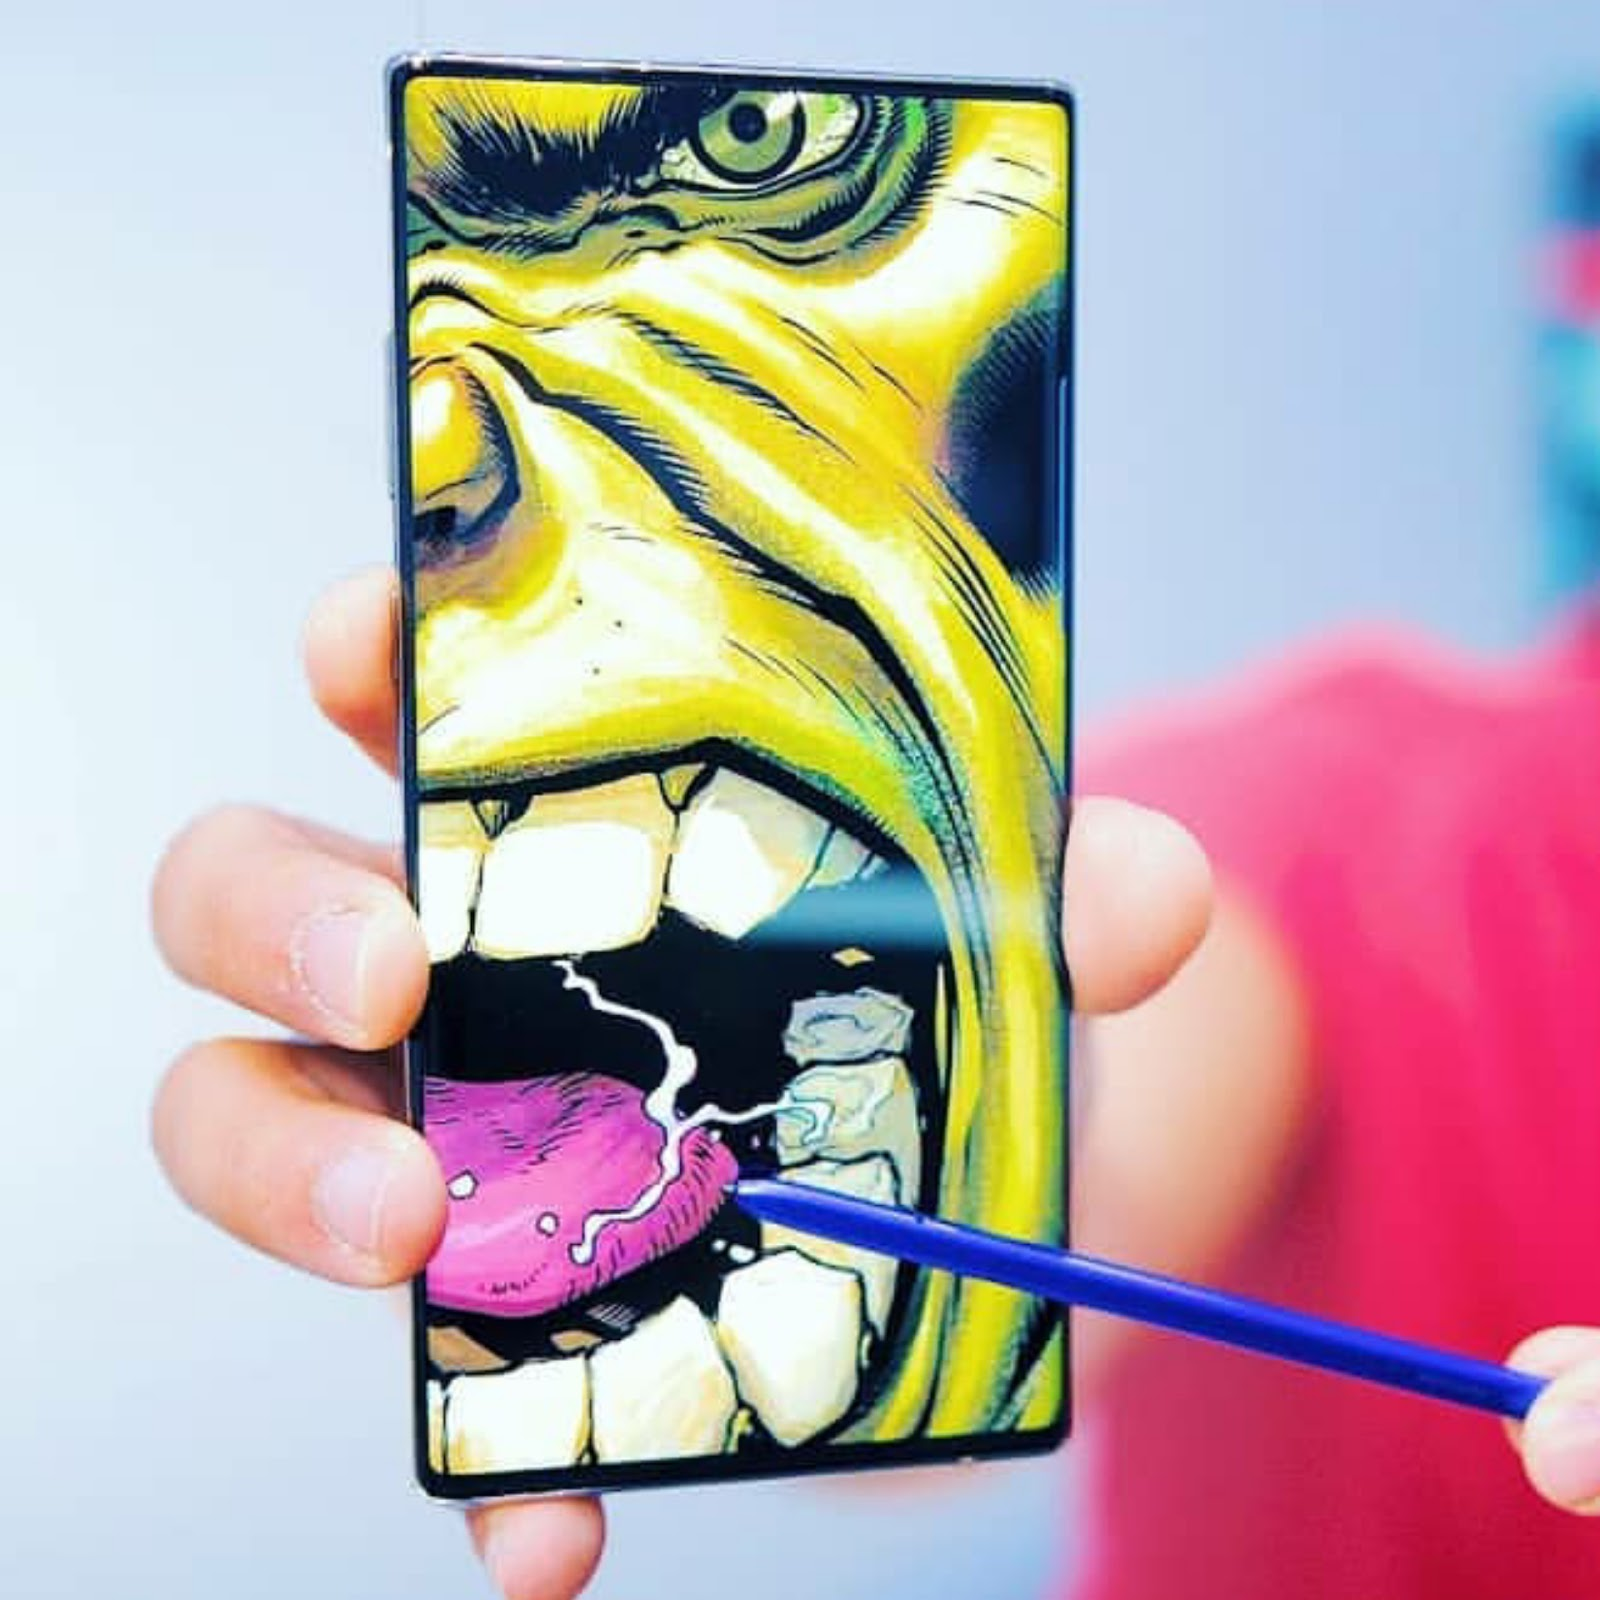 Hulk Genius Wallpaper Galaxy Note 10 Moudreview